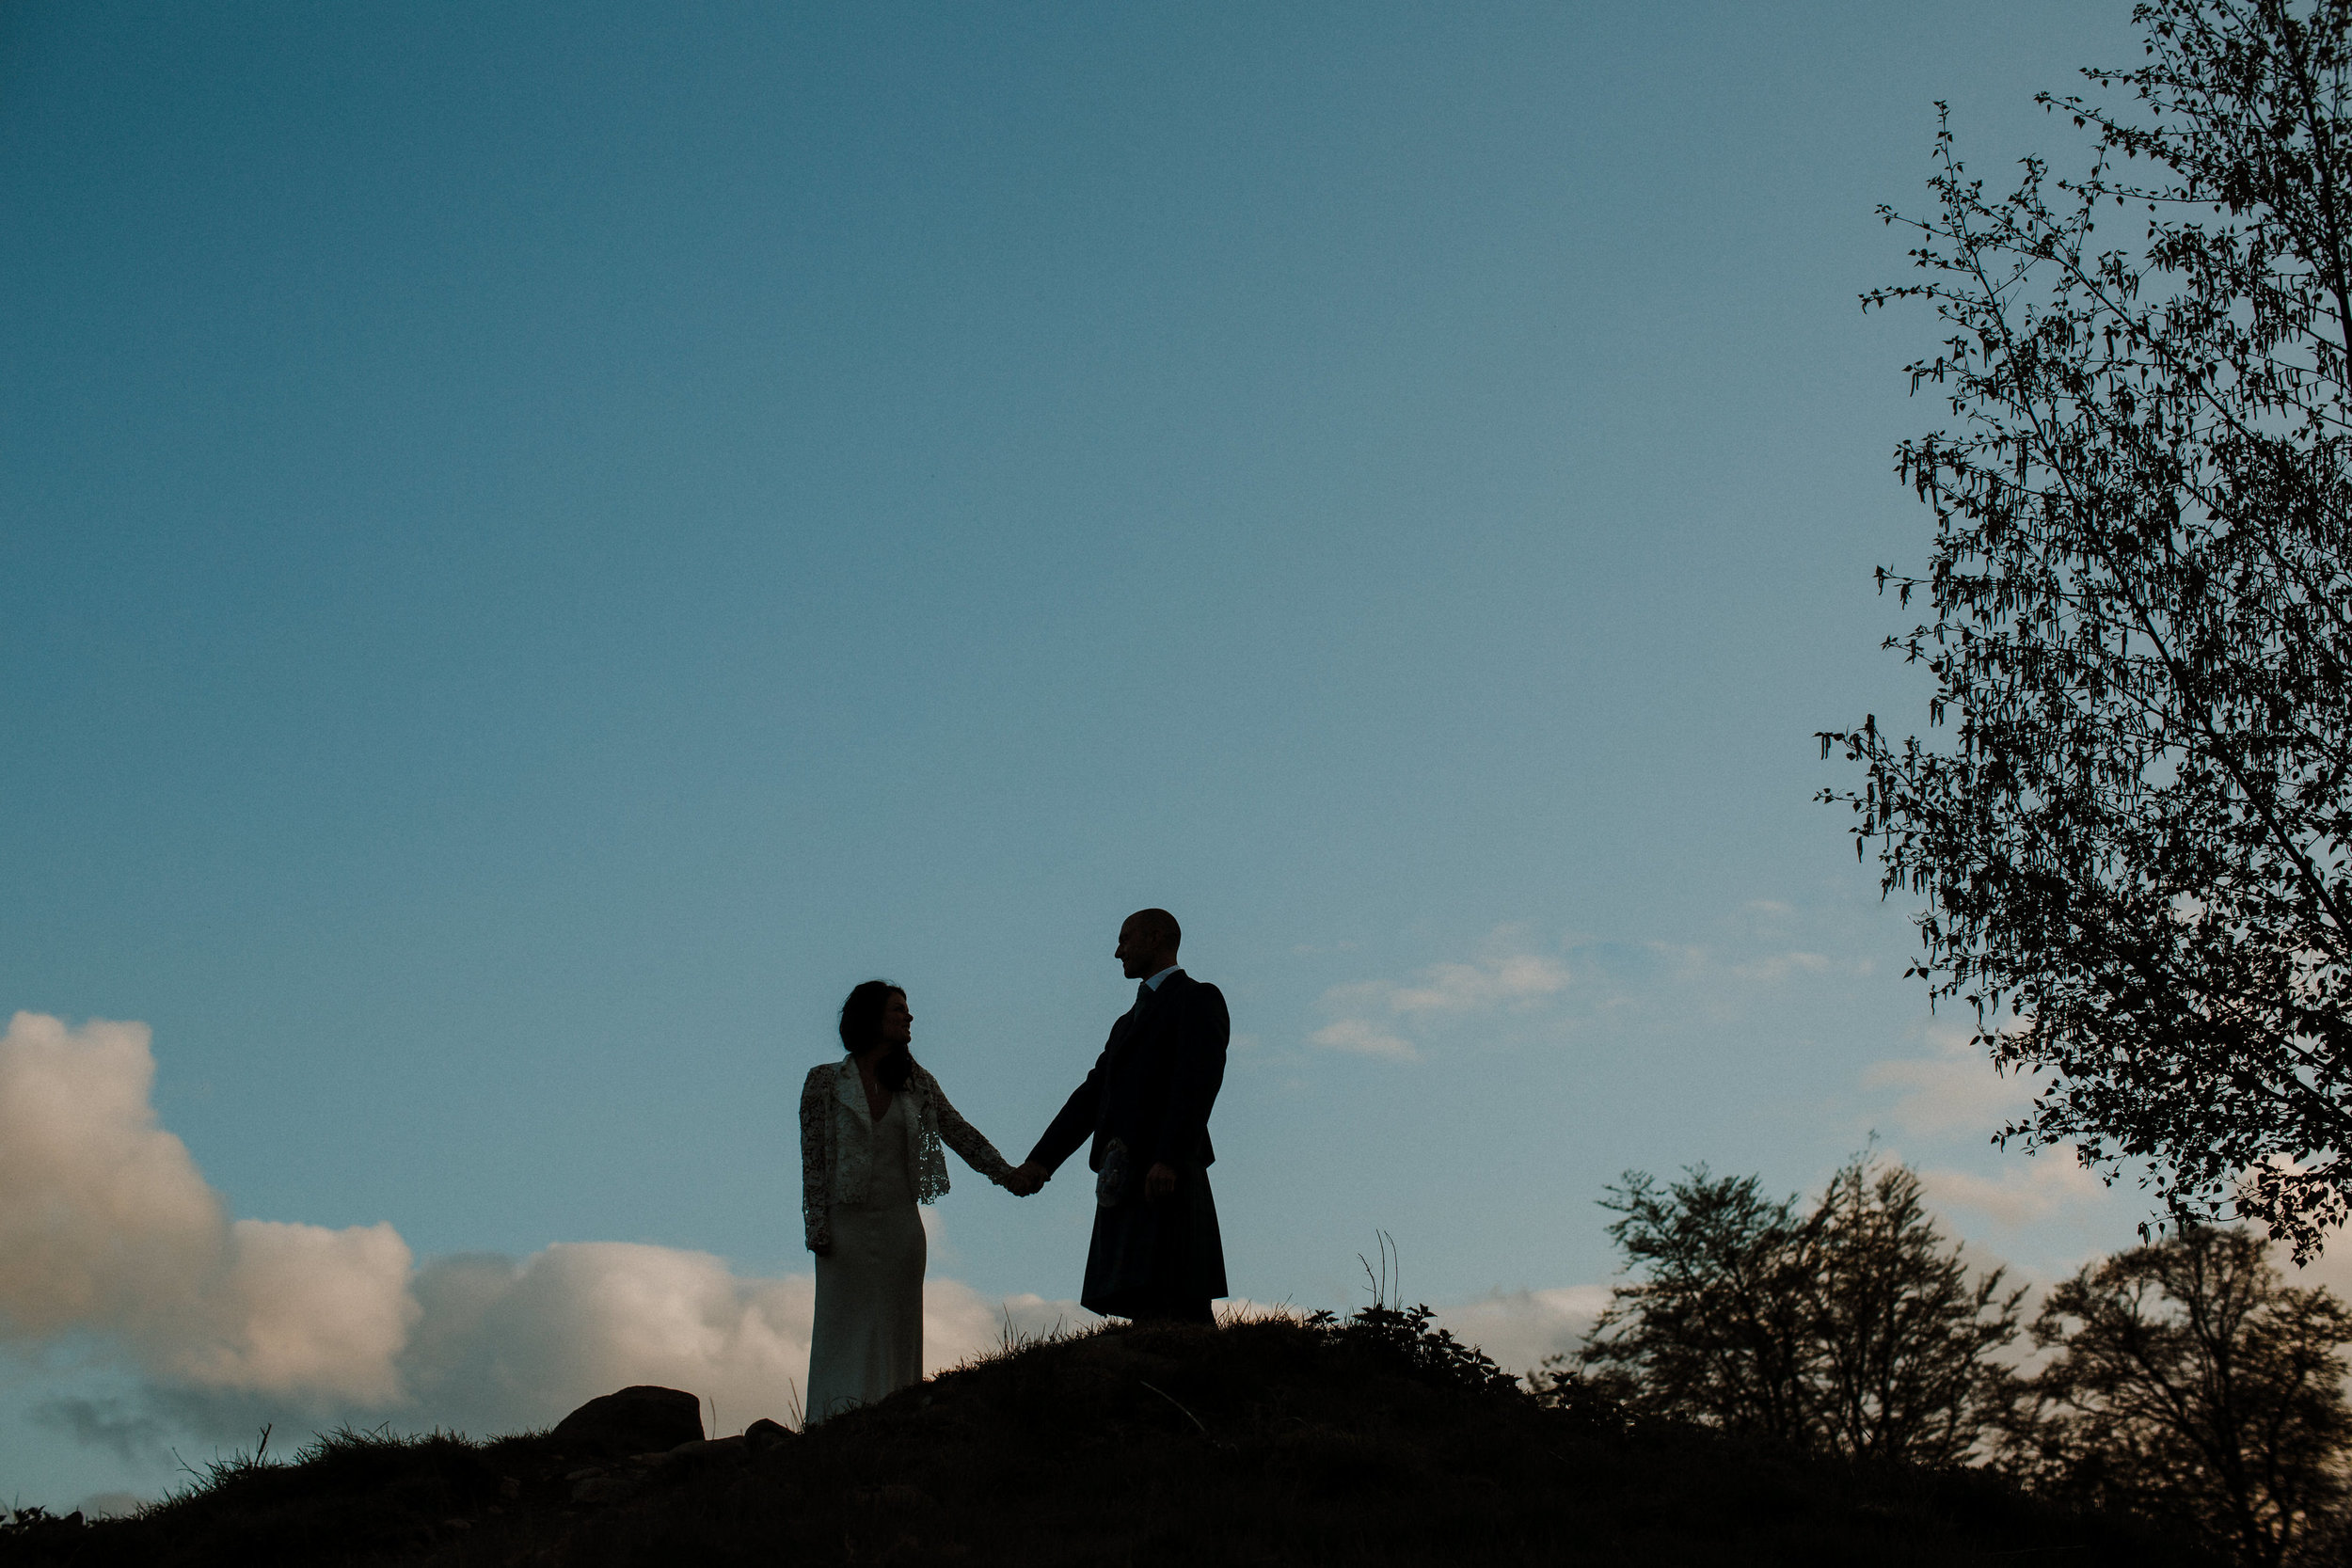 Katt-Scotland-Comrie-Crieff-Bias-Crepe-Wedding-Gown-Lace-Bridal-Biker-Jacket-Bespoke-Susanna-Greening-Derbyshire-22